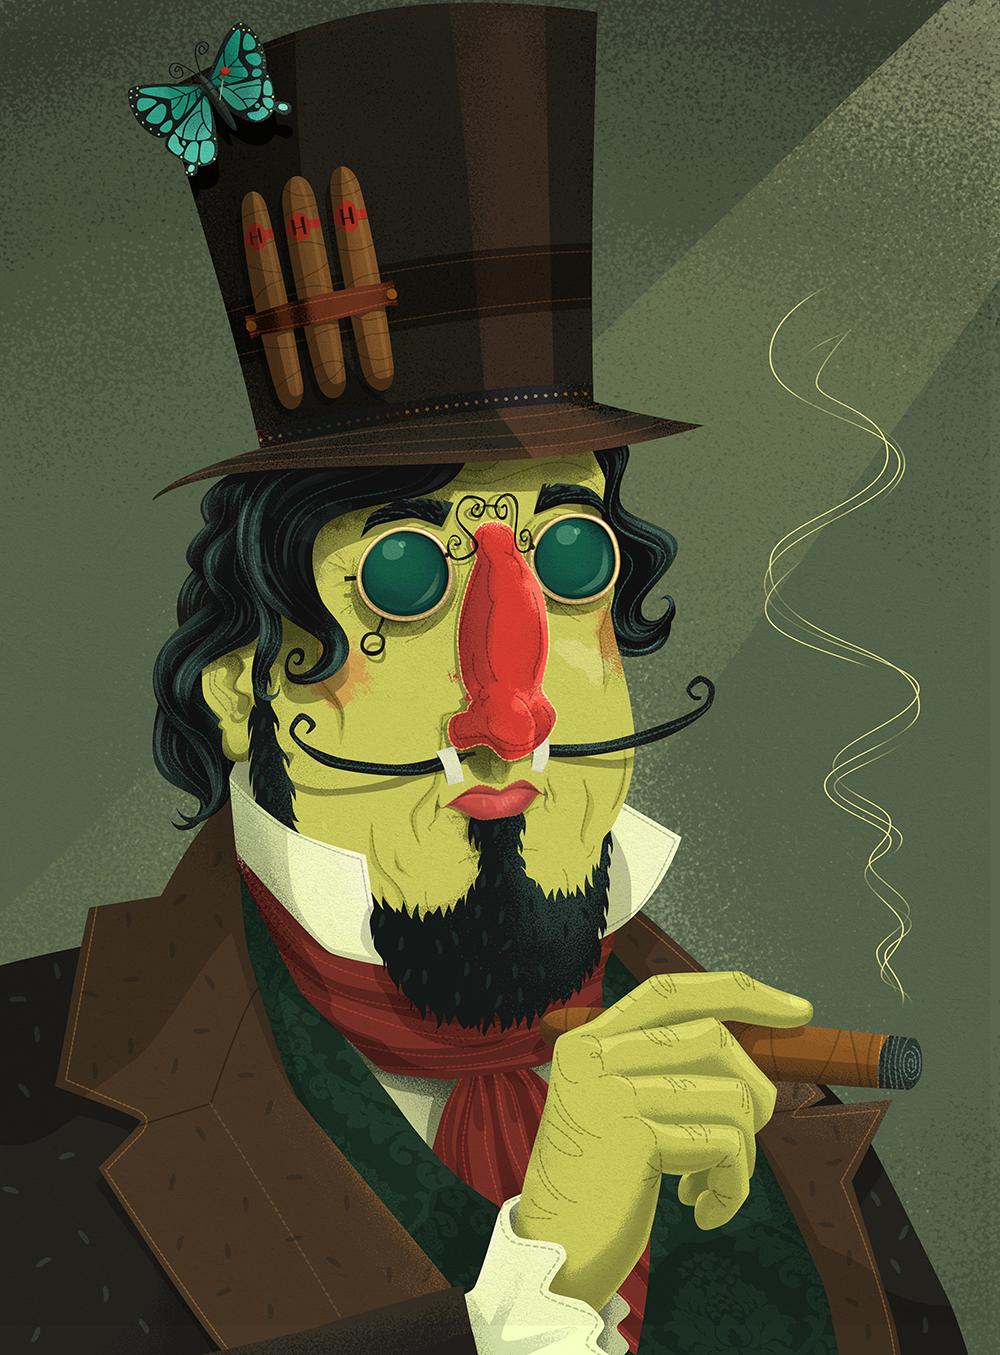 cigar_characters_steve_simpson_cigarmonkeys_1.jpg